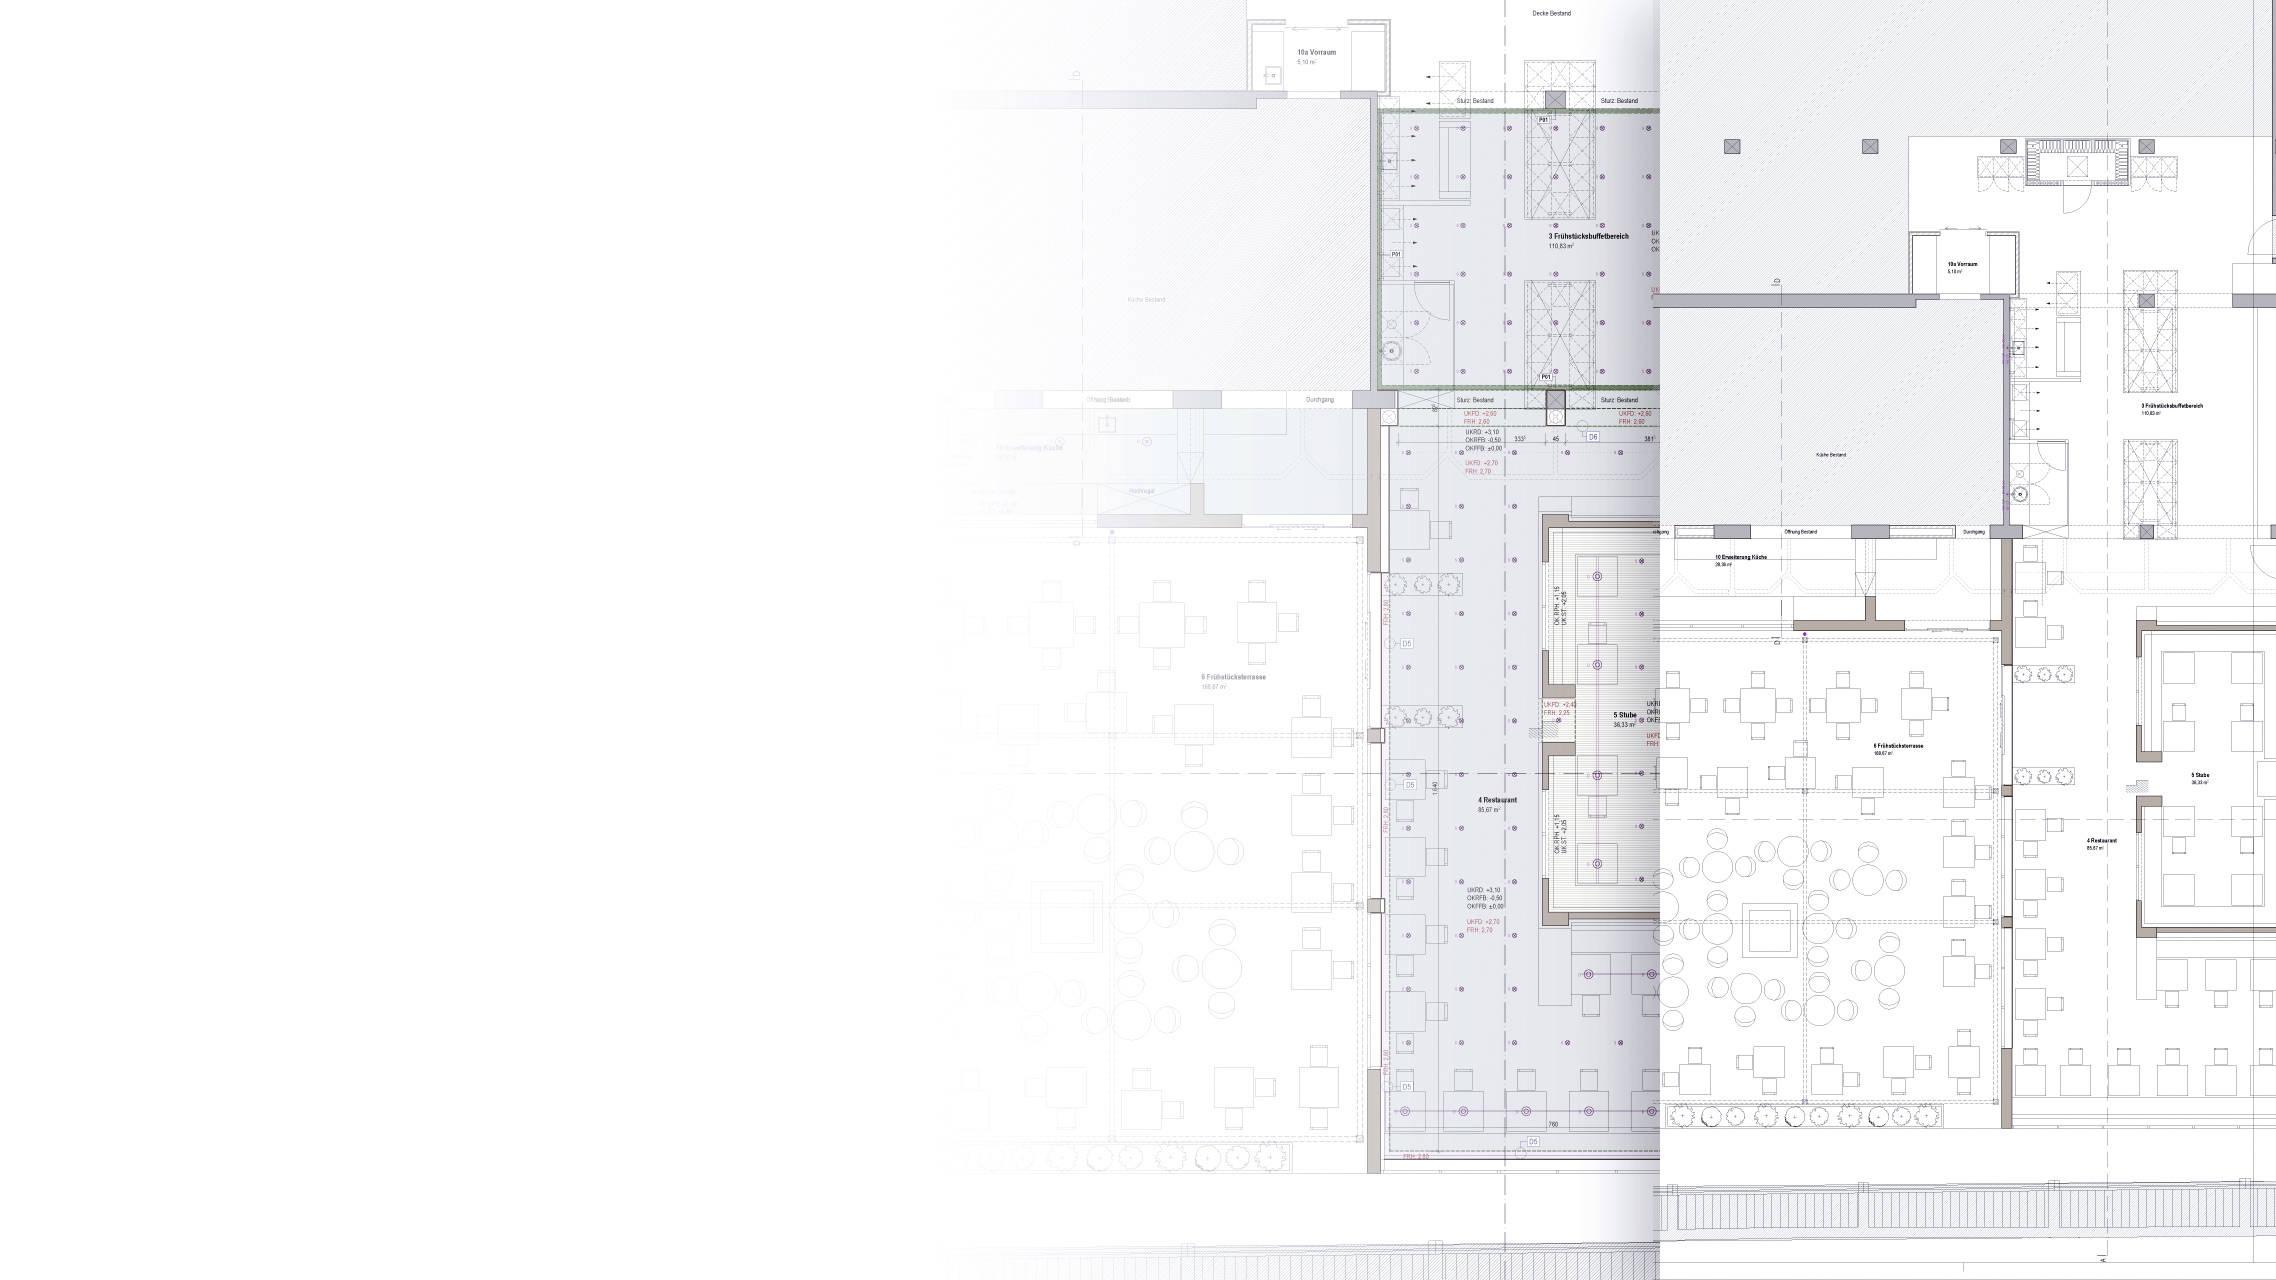 M&E / HVACR planning